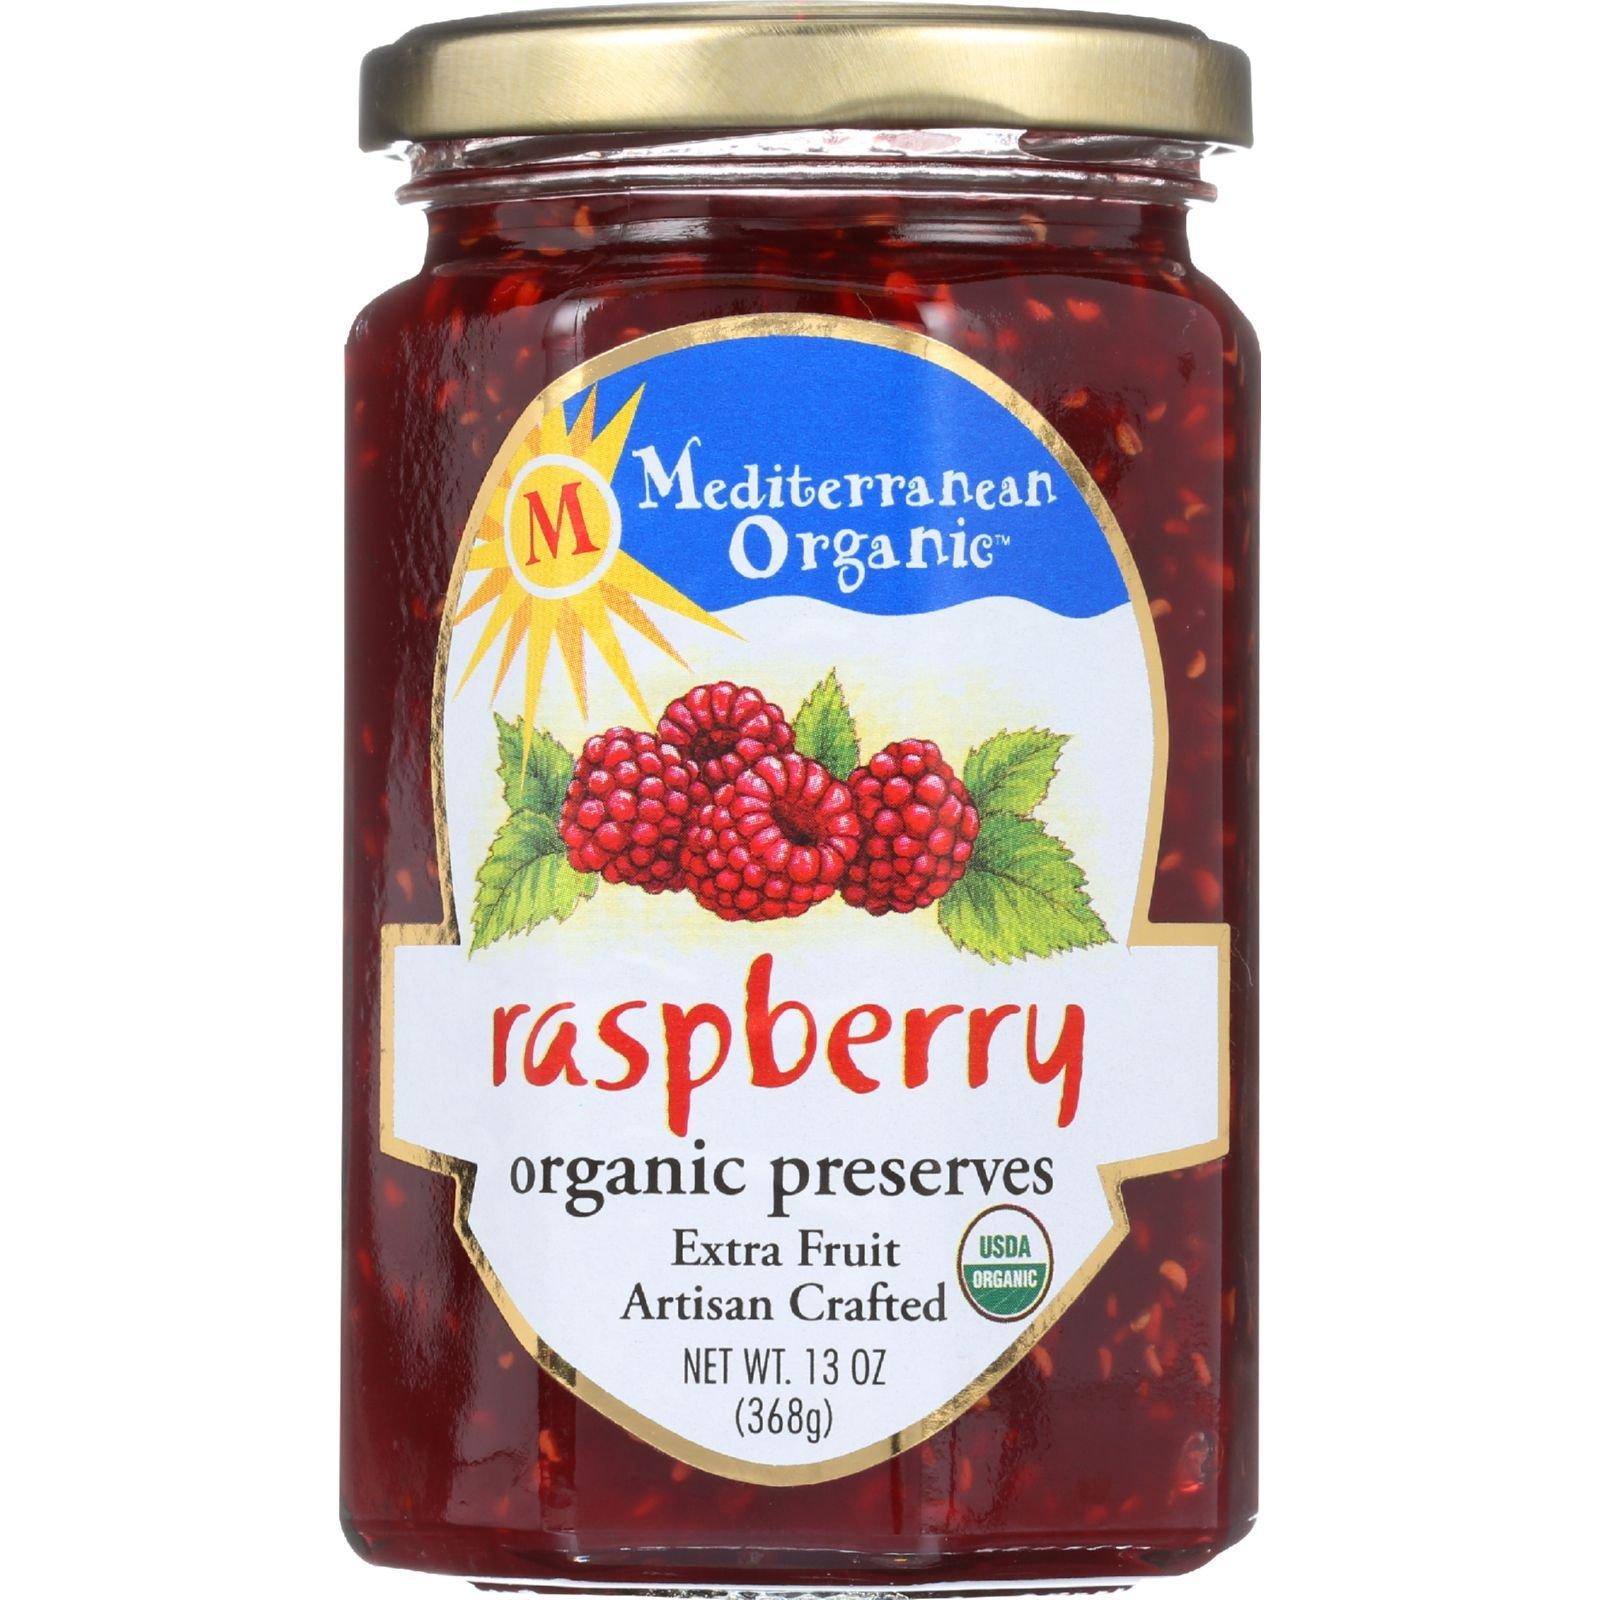 Mediterranean Organic Organic Raspberry Preserves - 13 oz